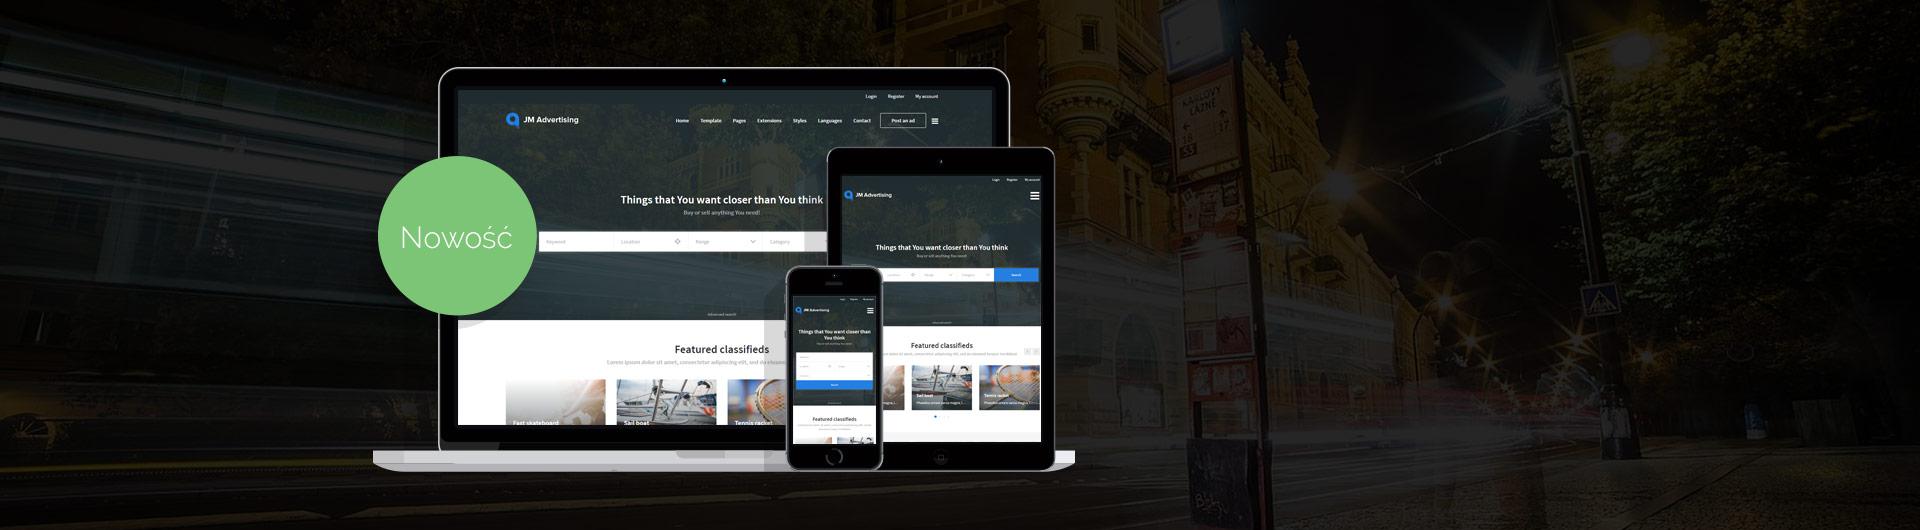 JM Joomadvertising - portal ogłoszeniowy